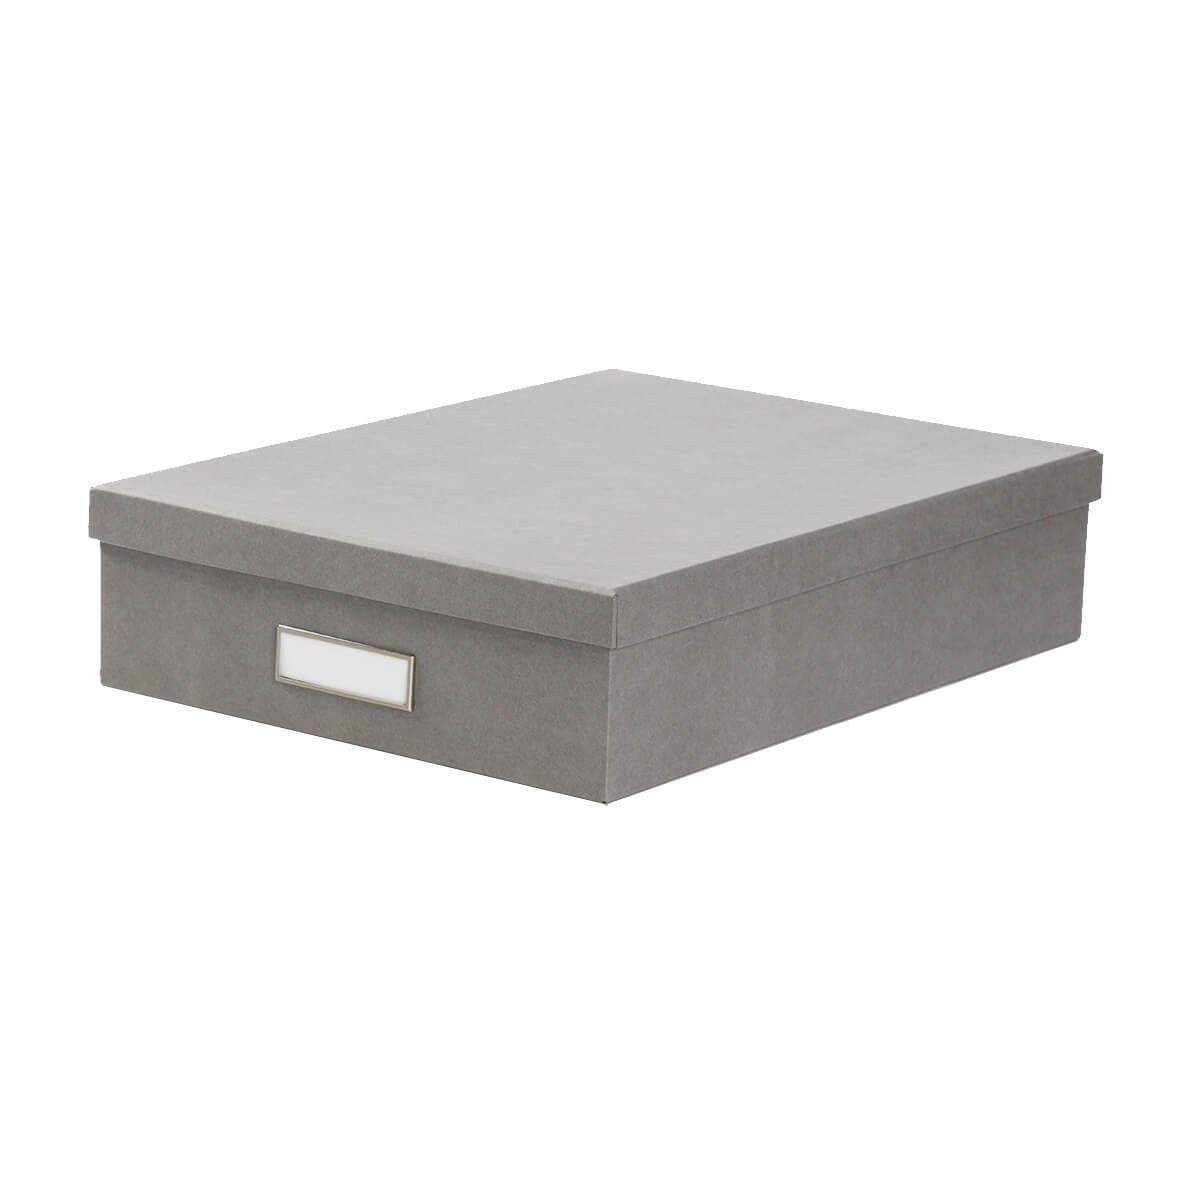 bo te a3 en carton gris clair classement. Black Bedroom Furniture Sets. Home Design Ideas